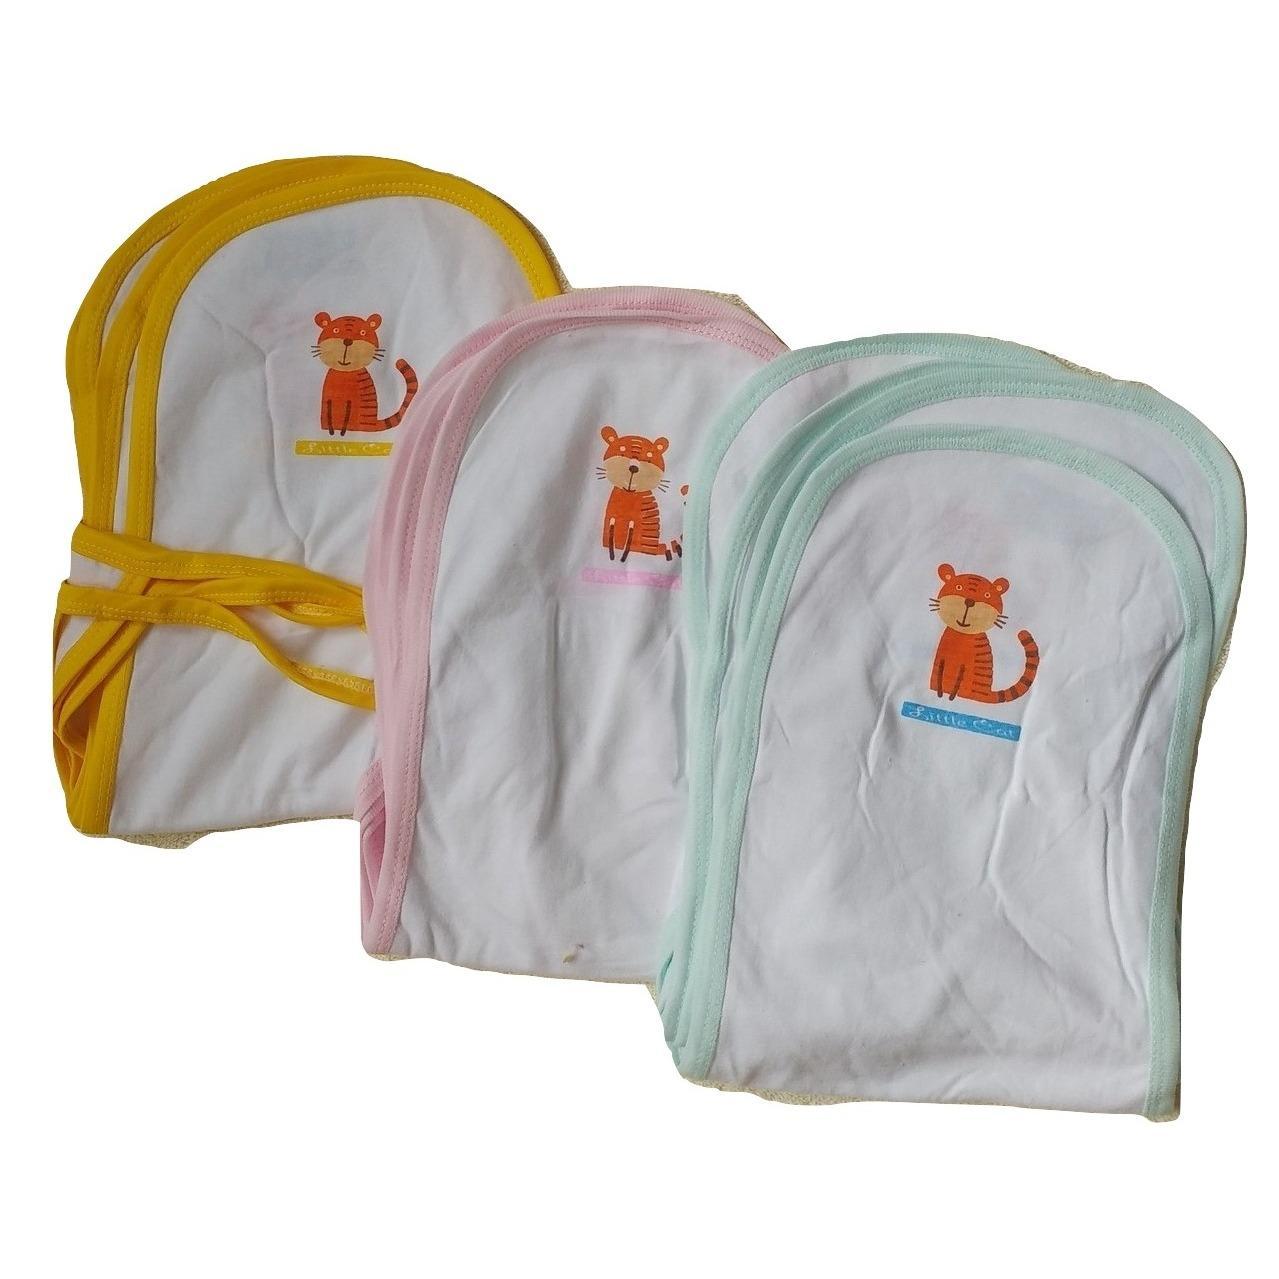 Pusat Jual Beli Jelova Angela Selusin Popok Baby Bayi Brayan Premium Quality Sni Standart 12Pcs Mixcolour Dki Jakarta